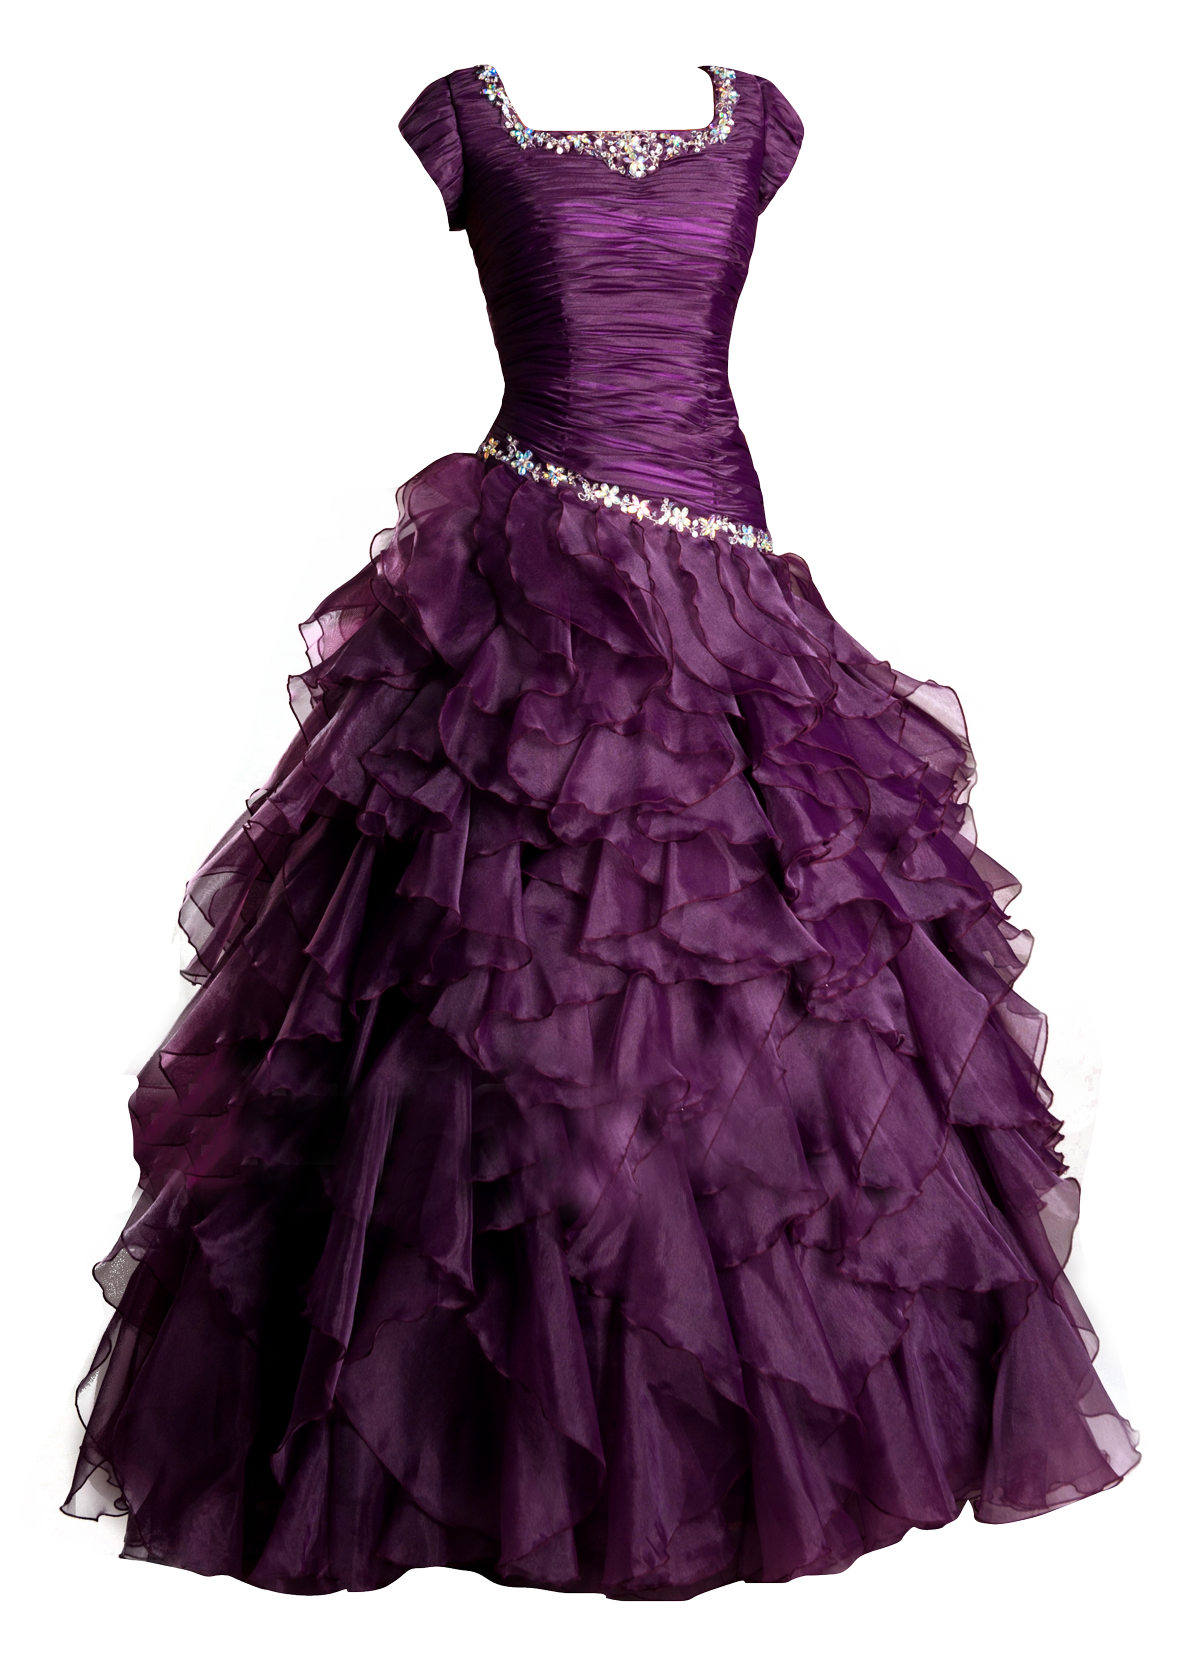 HQ Dress PNG Transparent Dress.PNG Images..